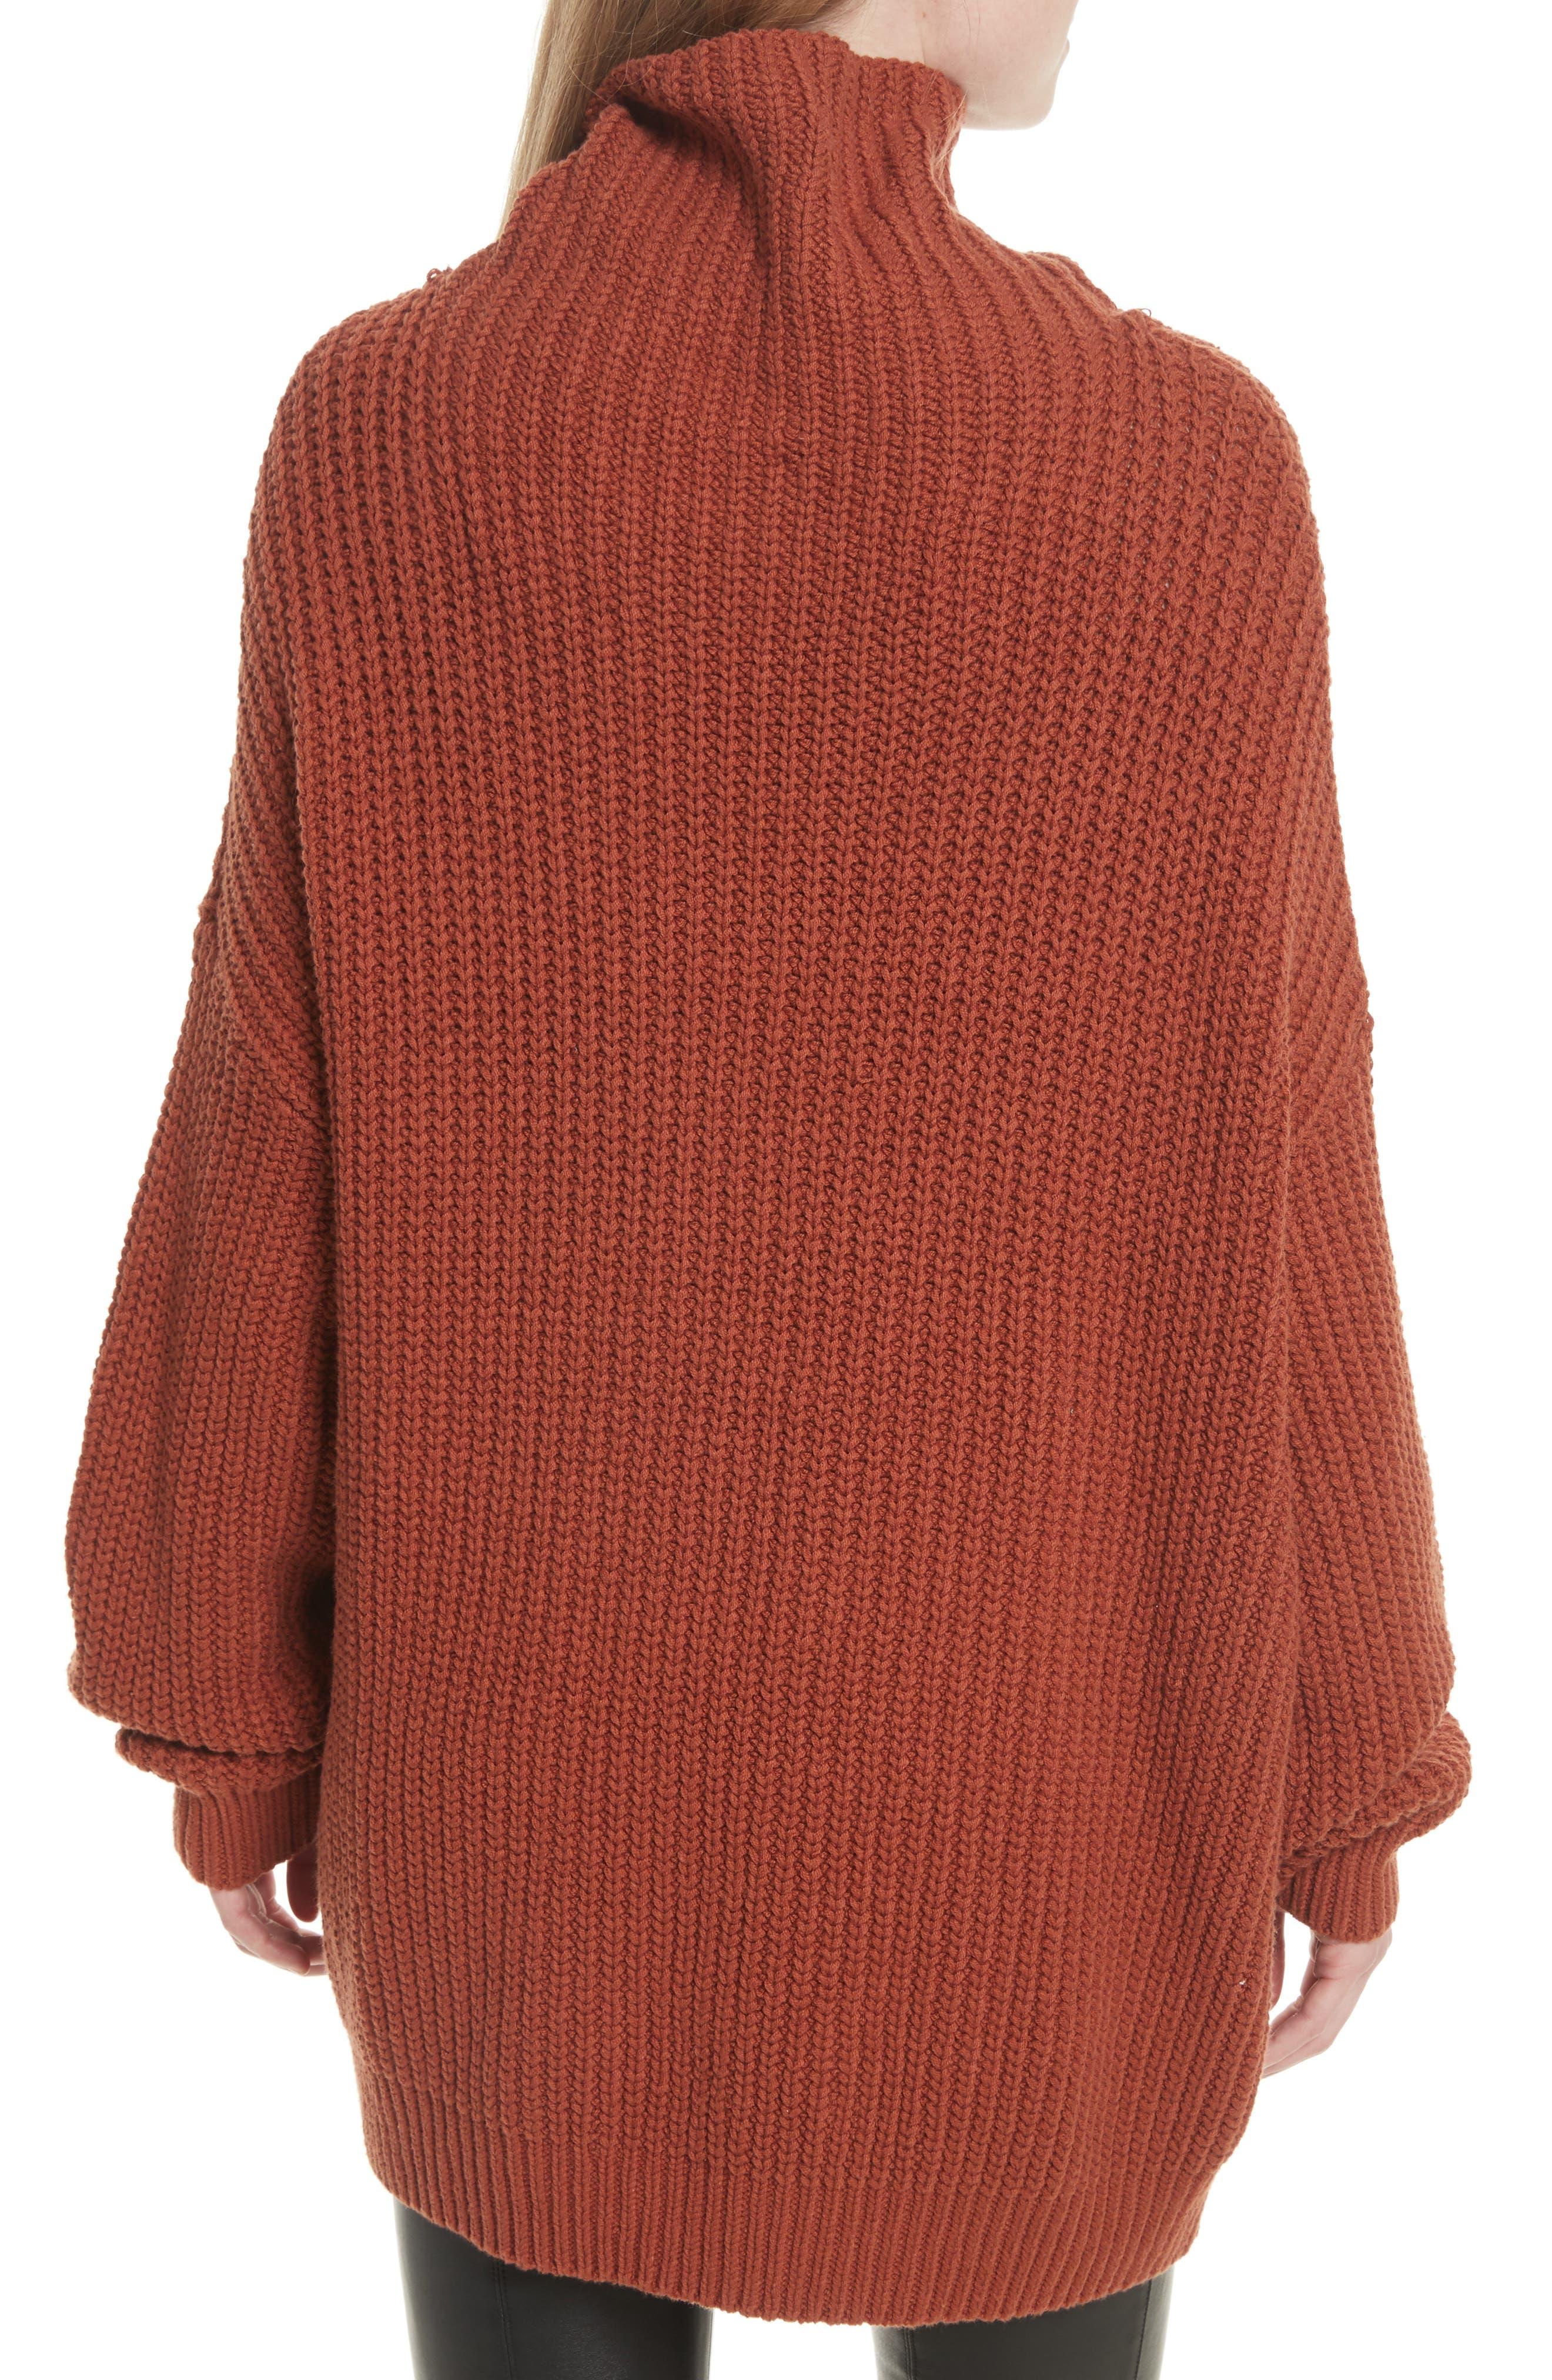 Swim Too Deep Turtleneck Sweater,                             Alternate thumbnail 7, color,